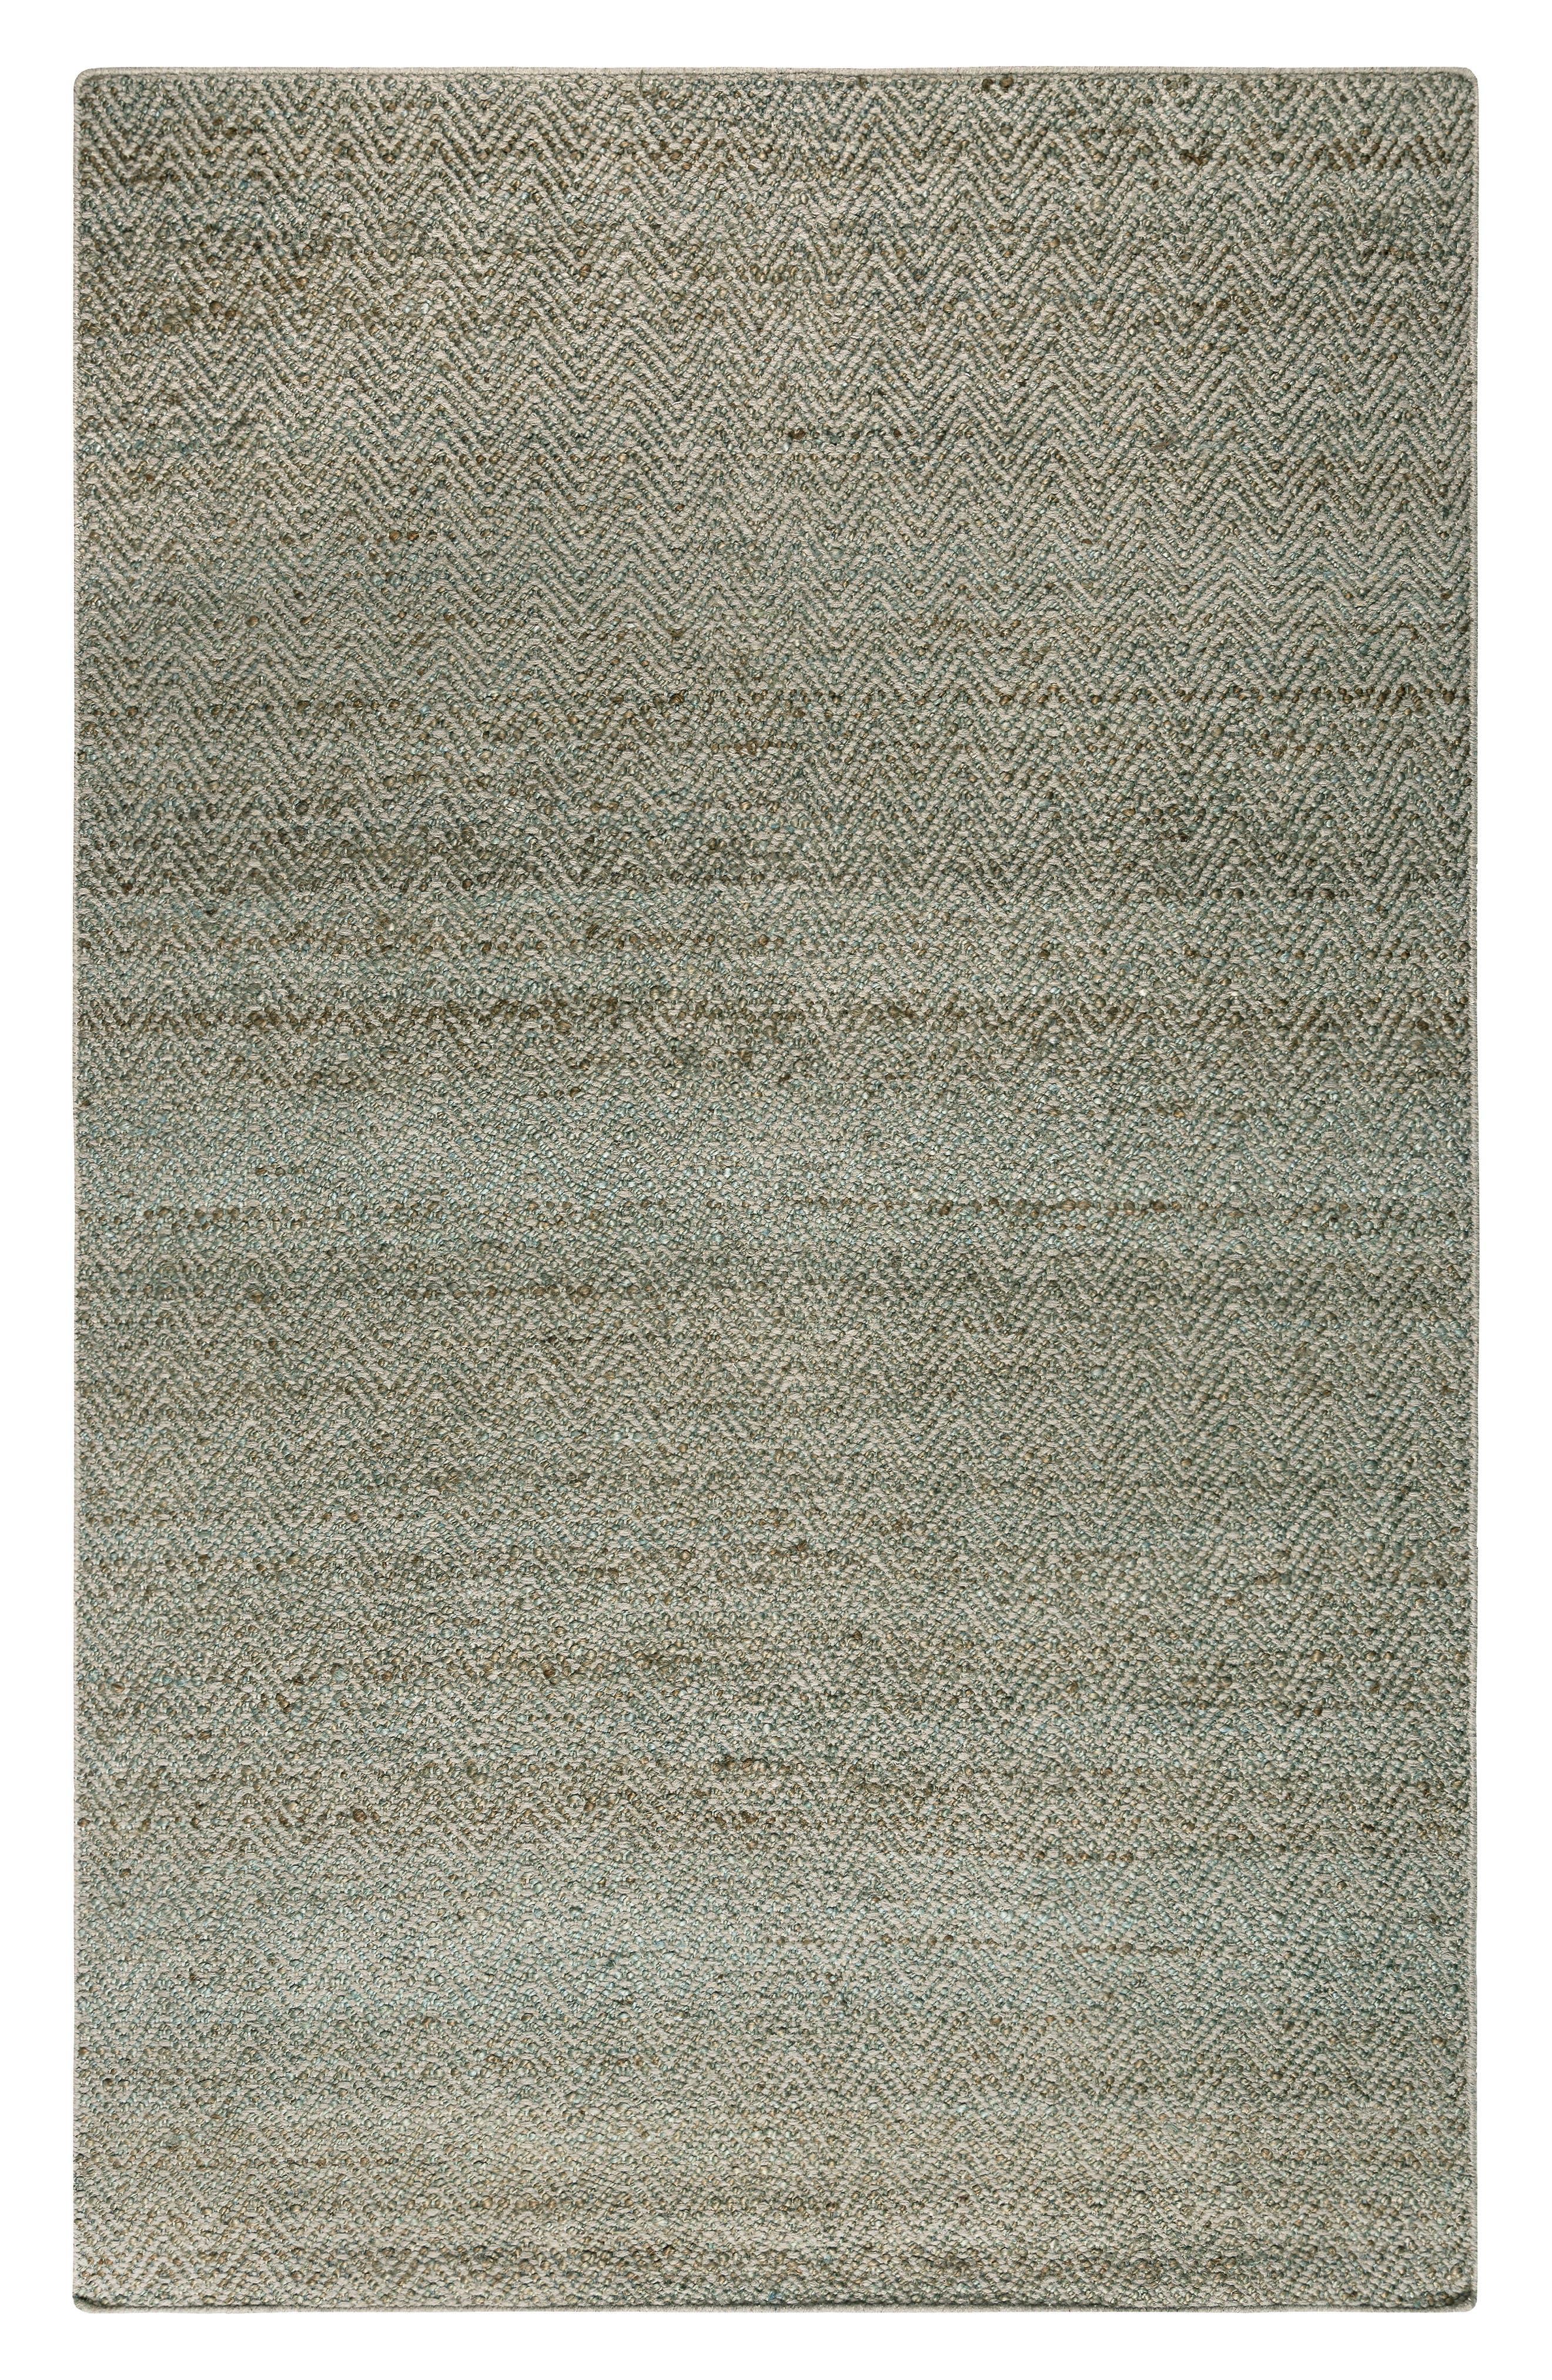 Rizzy Home 'Ellington' Hand Loomed Jute & Wool Area Rug